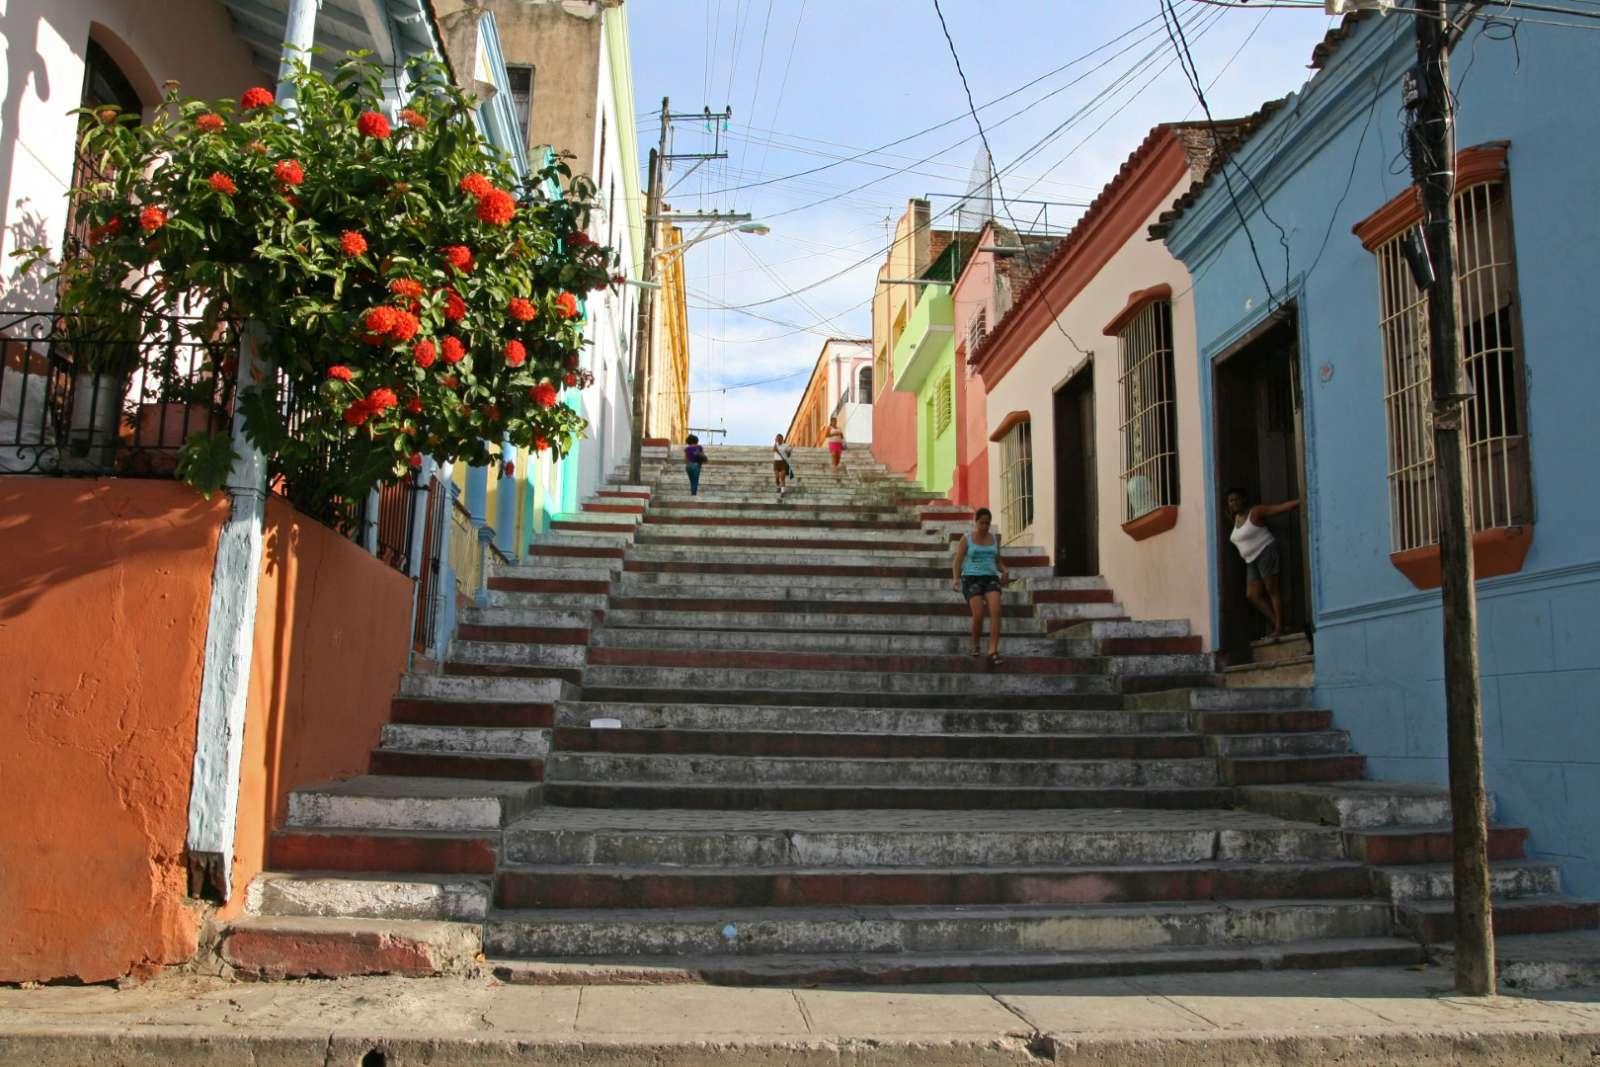 Spanish steps in Santiago de Cuba